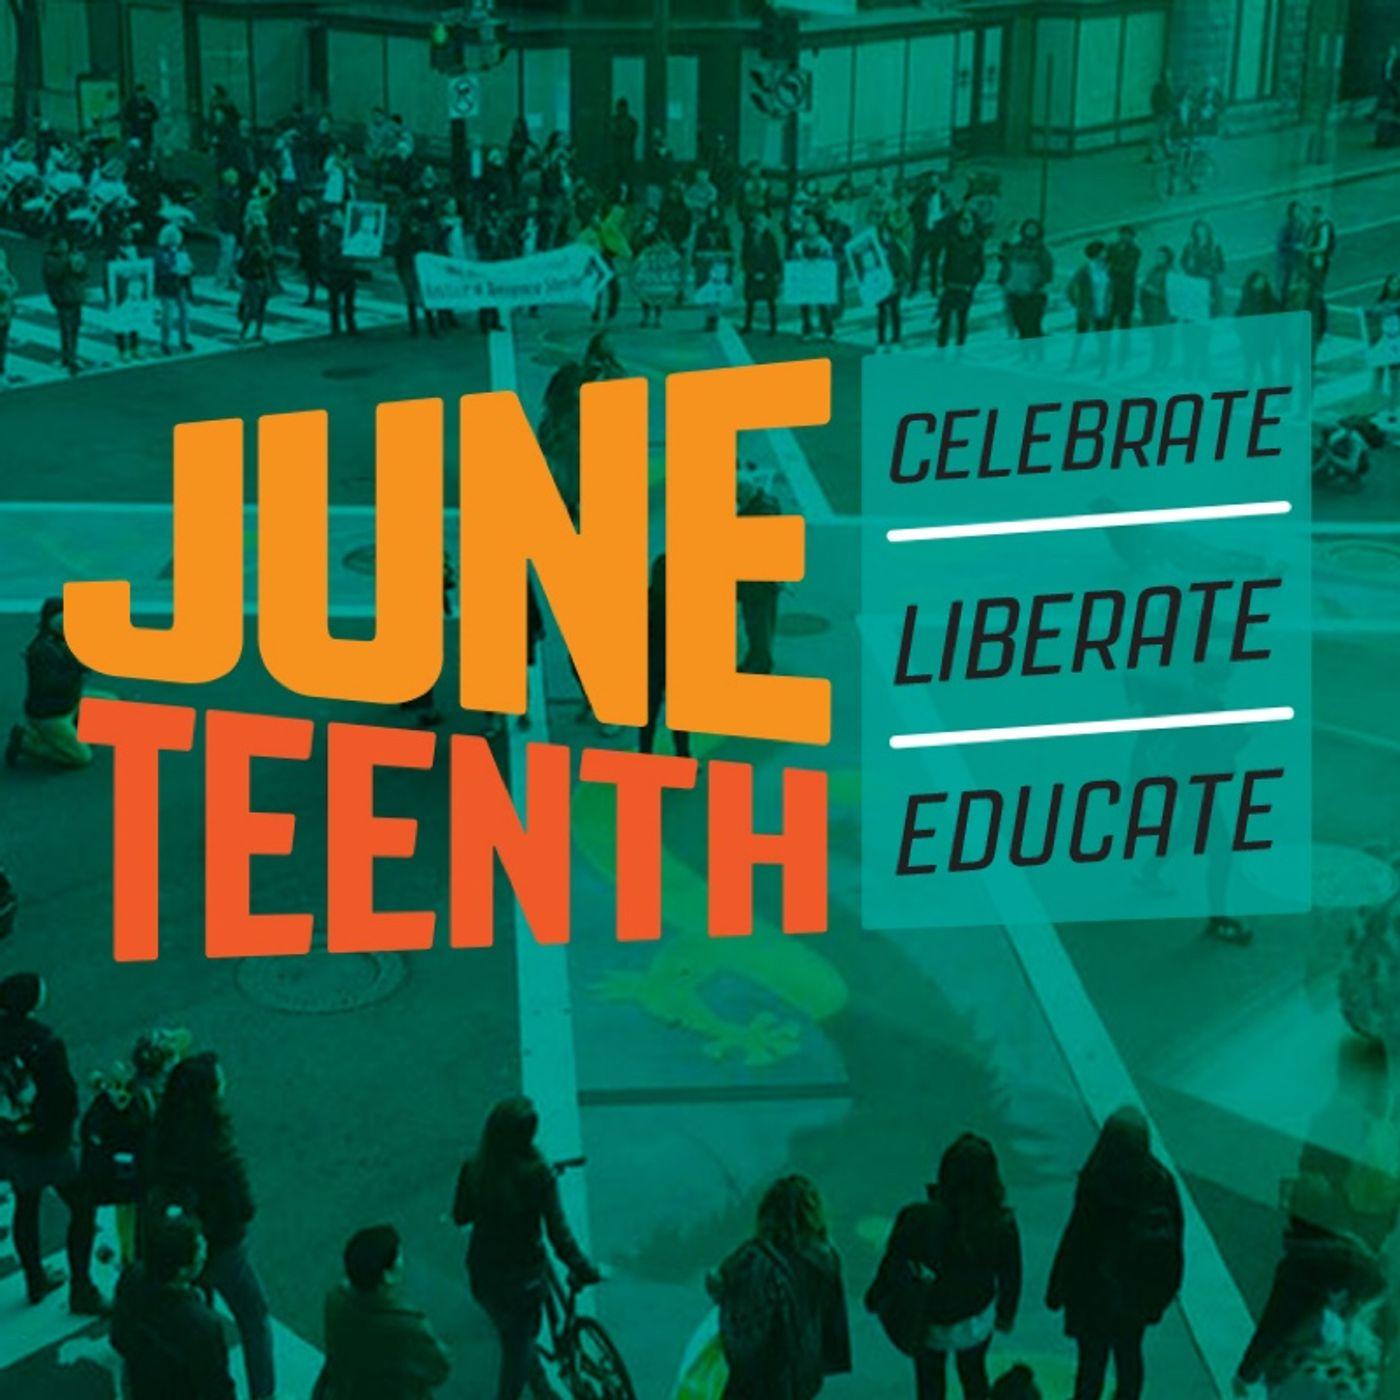 Juneteenth Celebration and worship